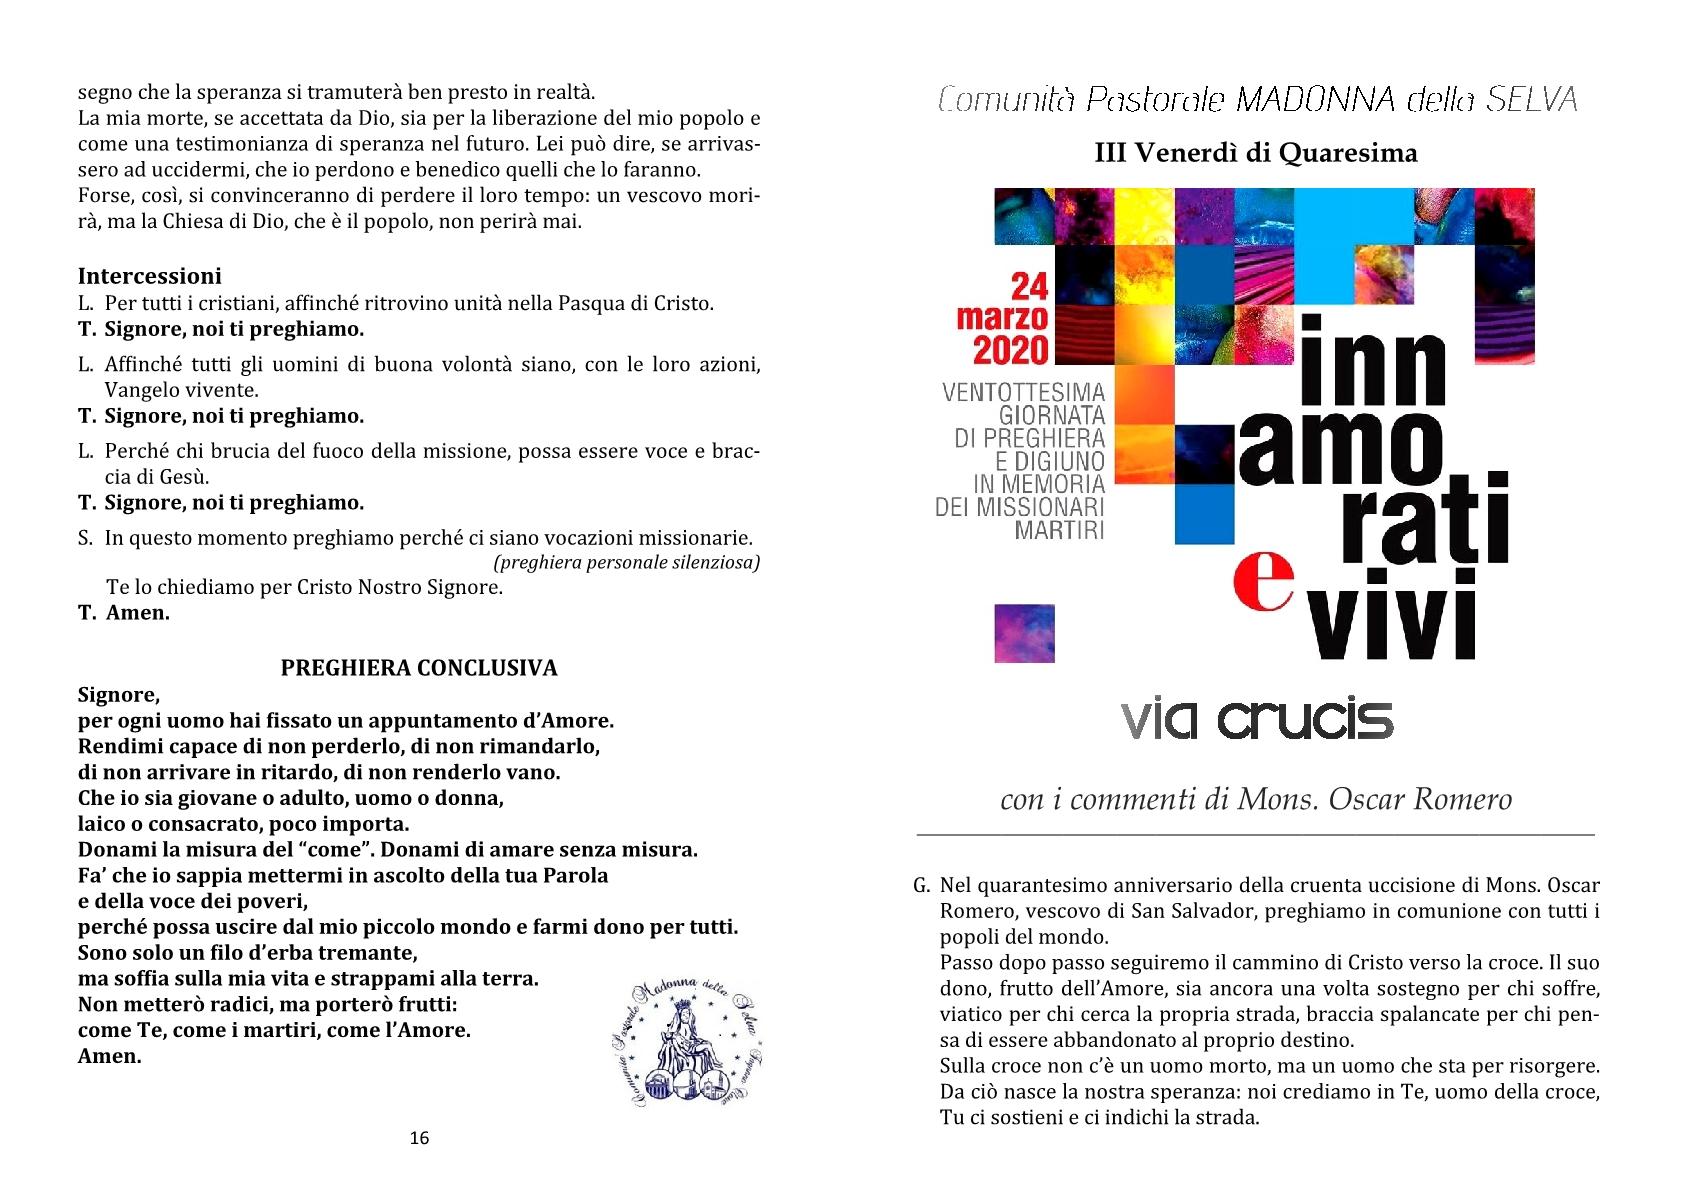 Via Crucis - III ven quar 2020 - martiri1